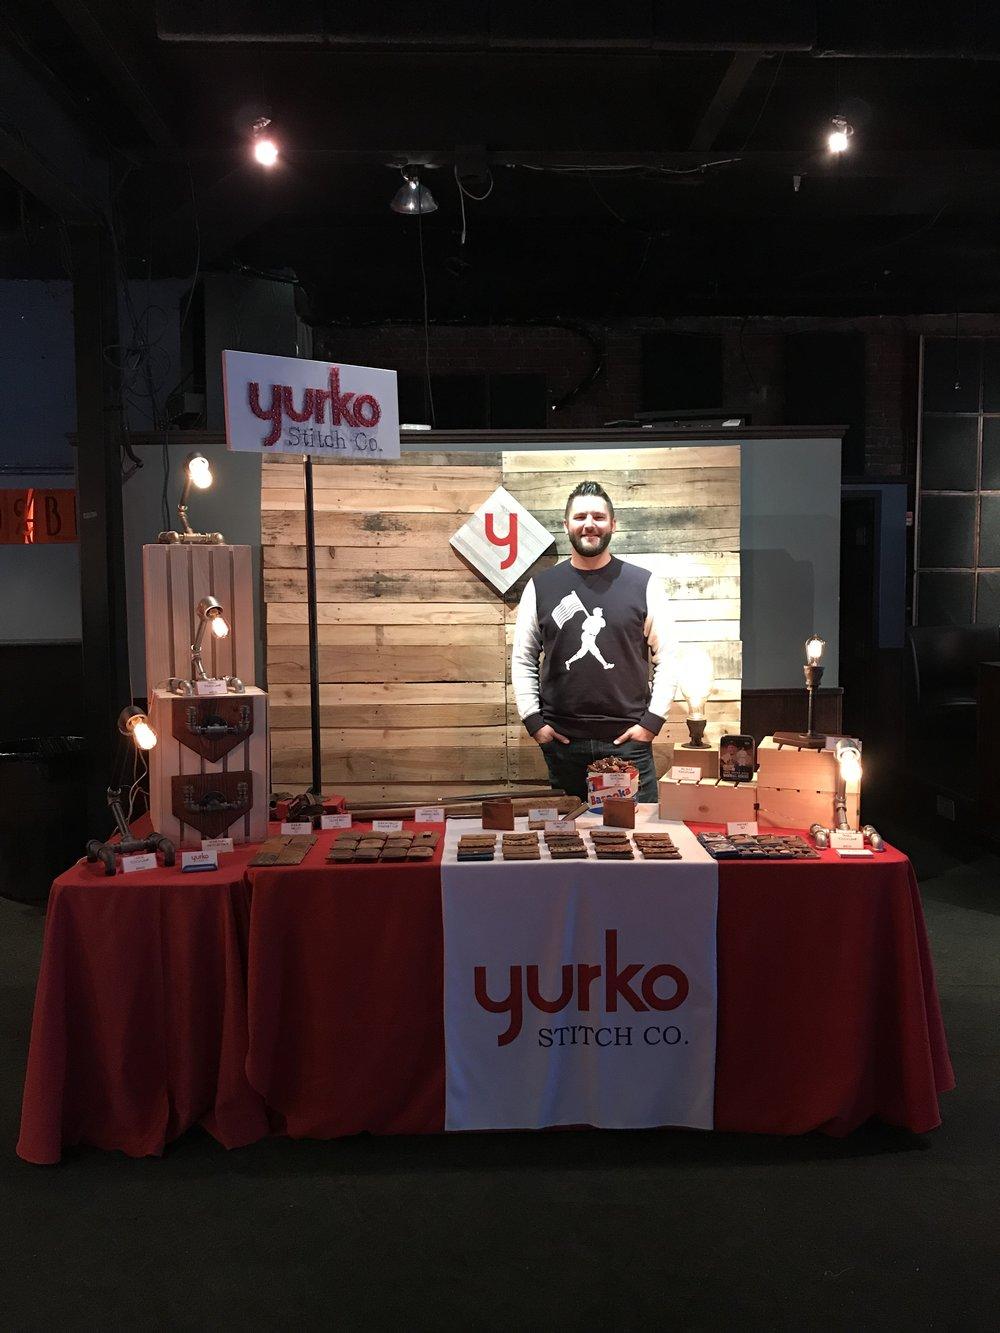 Yurko Stitch Co.